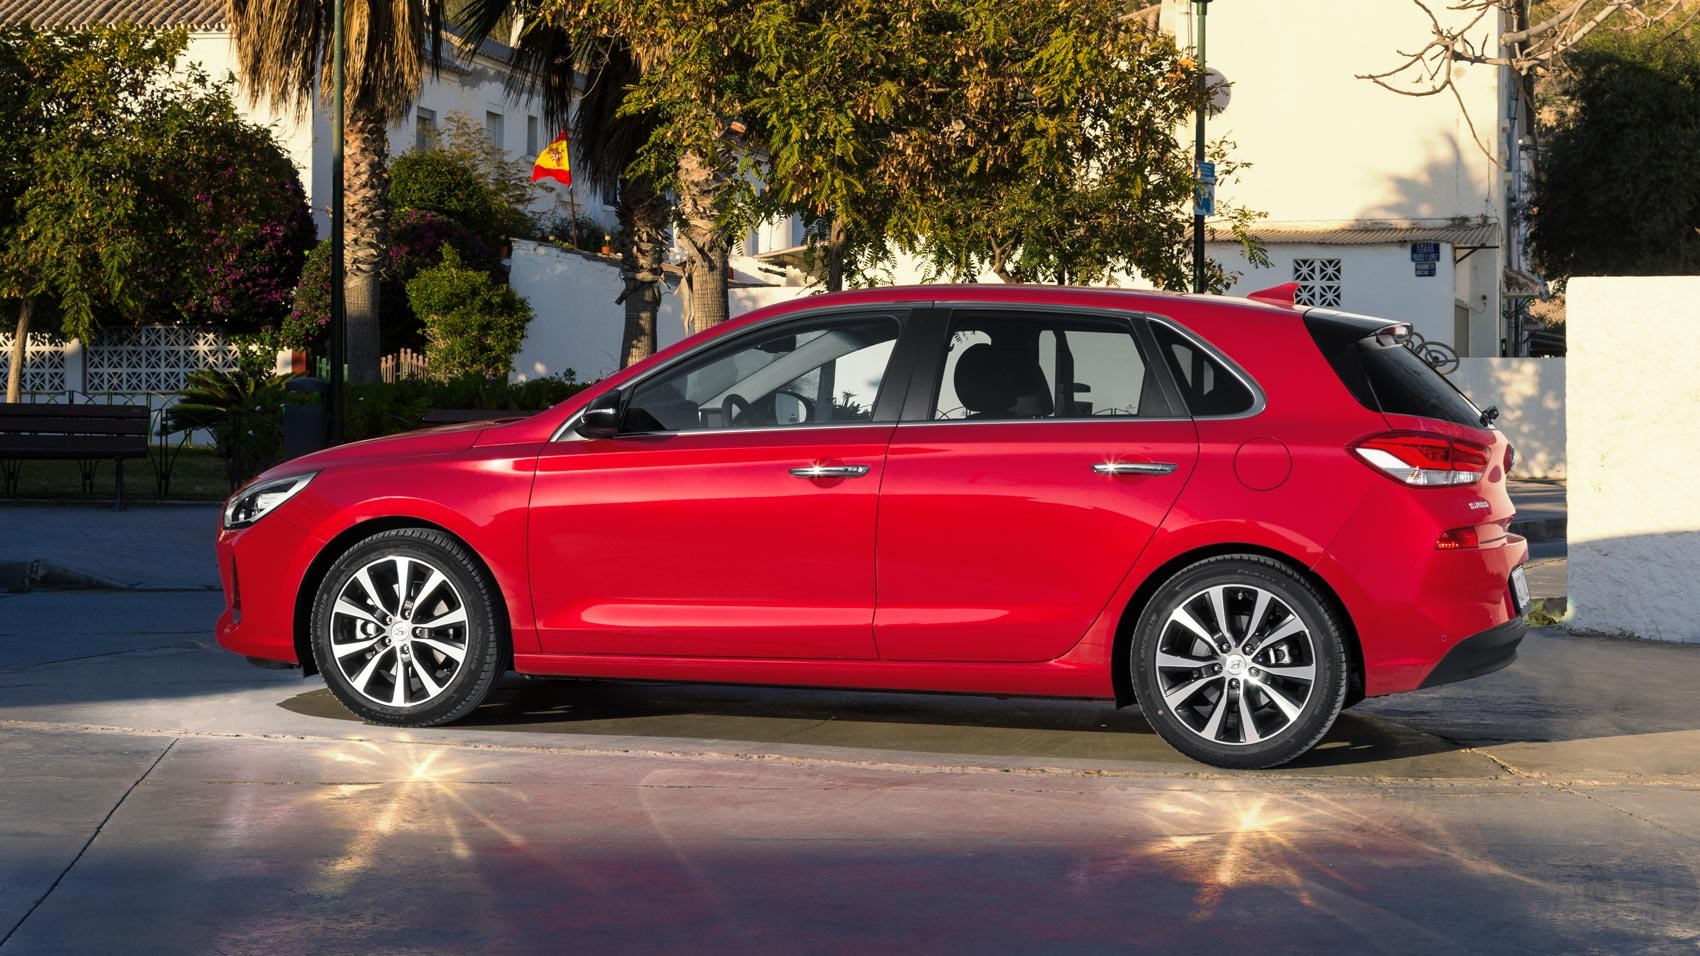 Hyundai i30 1 4 T-GDi 140PS Premium (2017) review | CAR Magazine